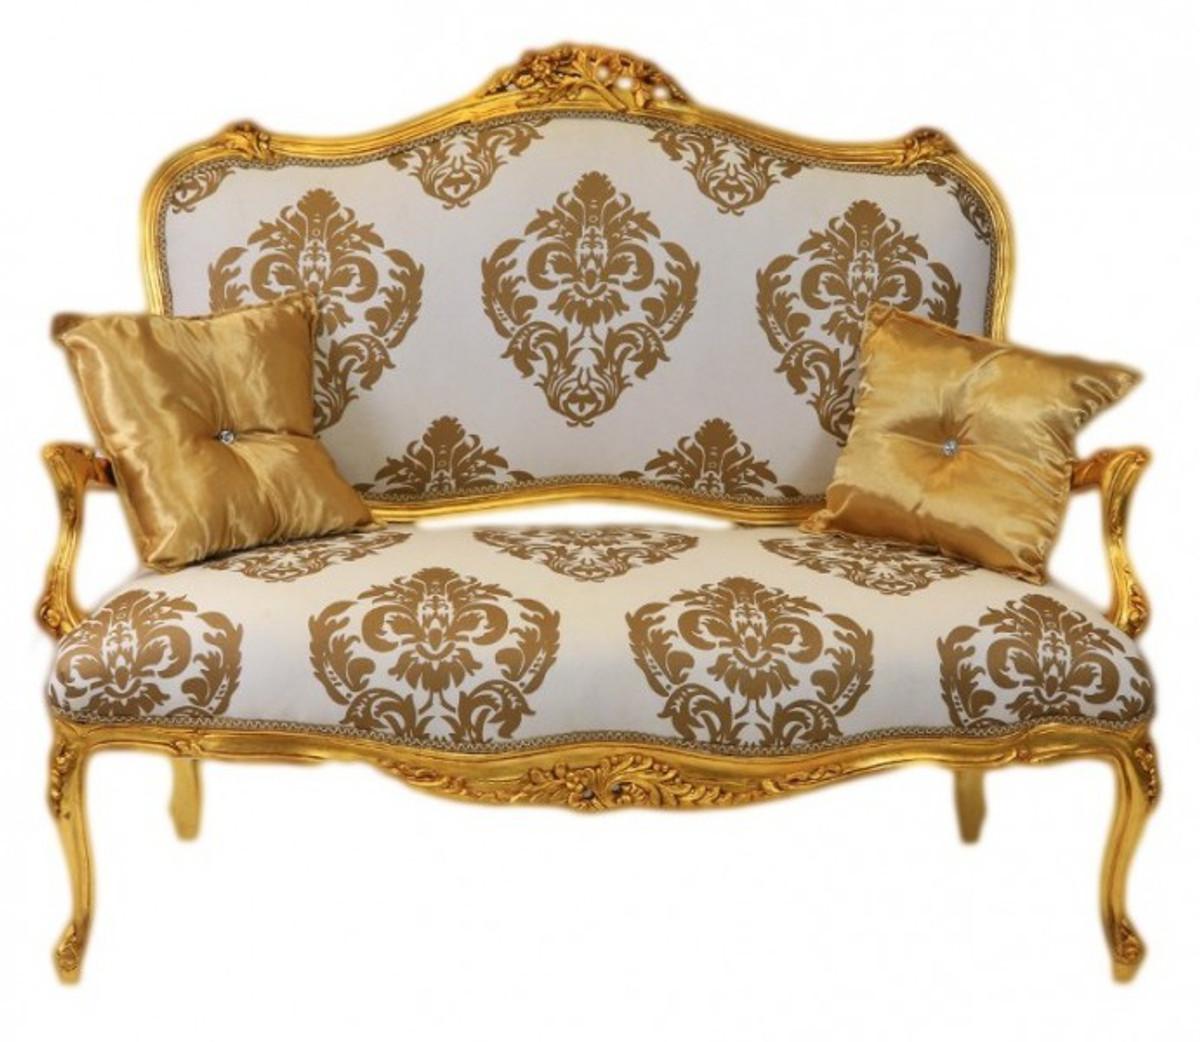 casa padrino barock sofa weiss gold muster gold italienischer stil barock mobel